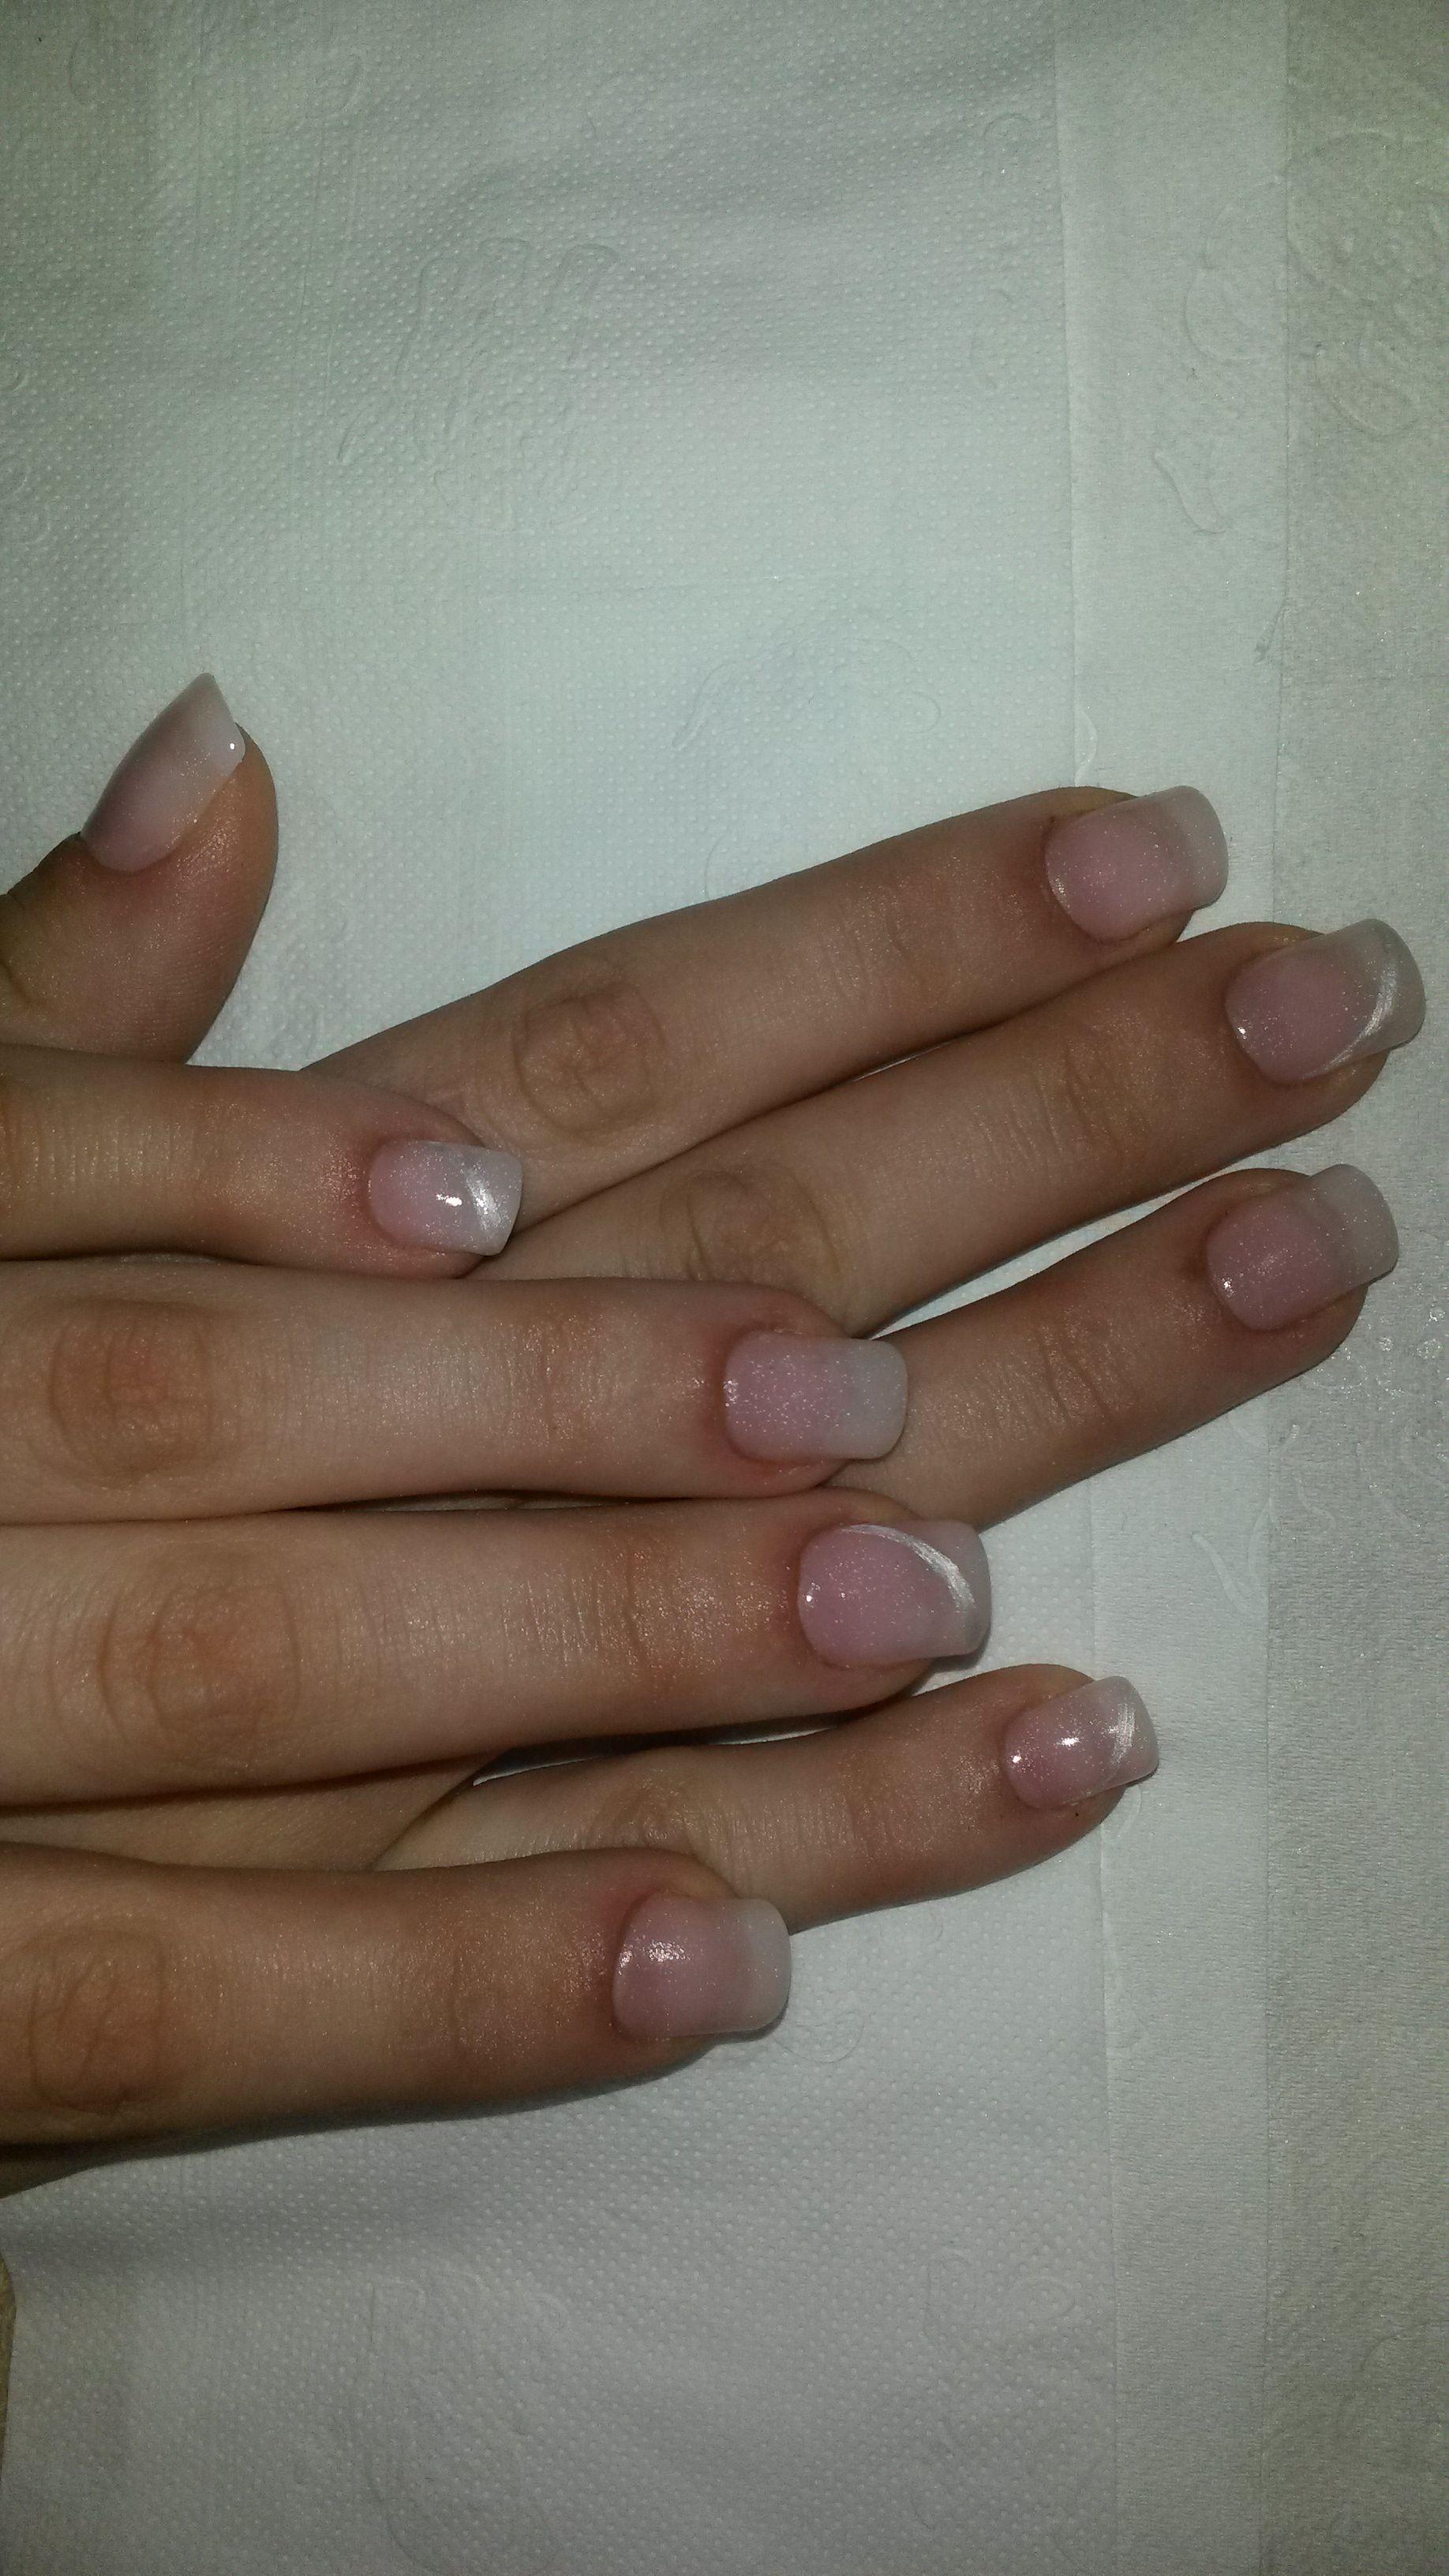 Testa Rossa Beauty East Rand Nail Technician Johannesburg Technician Mobile Technician Manicure Easy Nail Art Gel Manicure Gel Manicure Designs Manicure